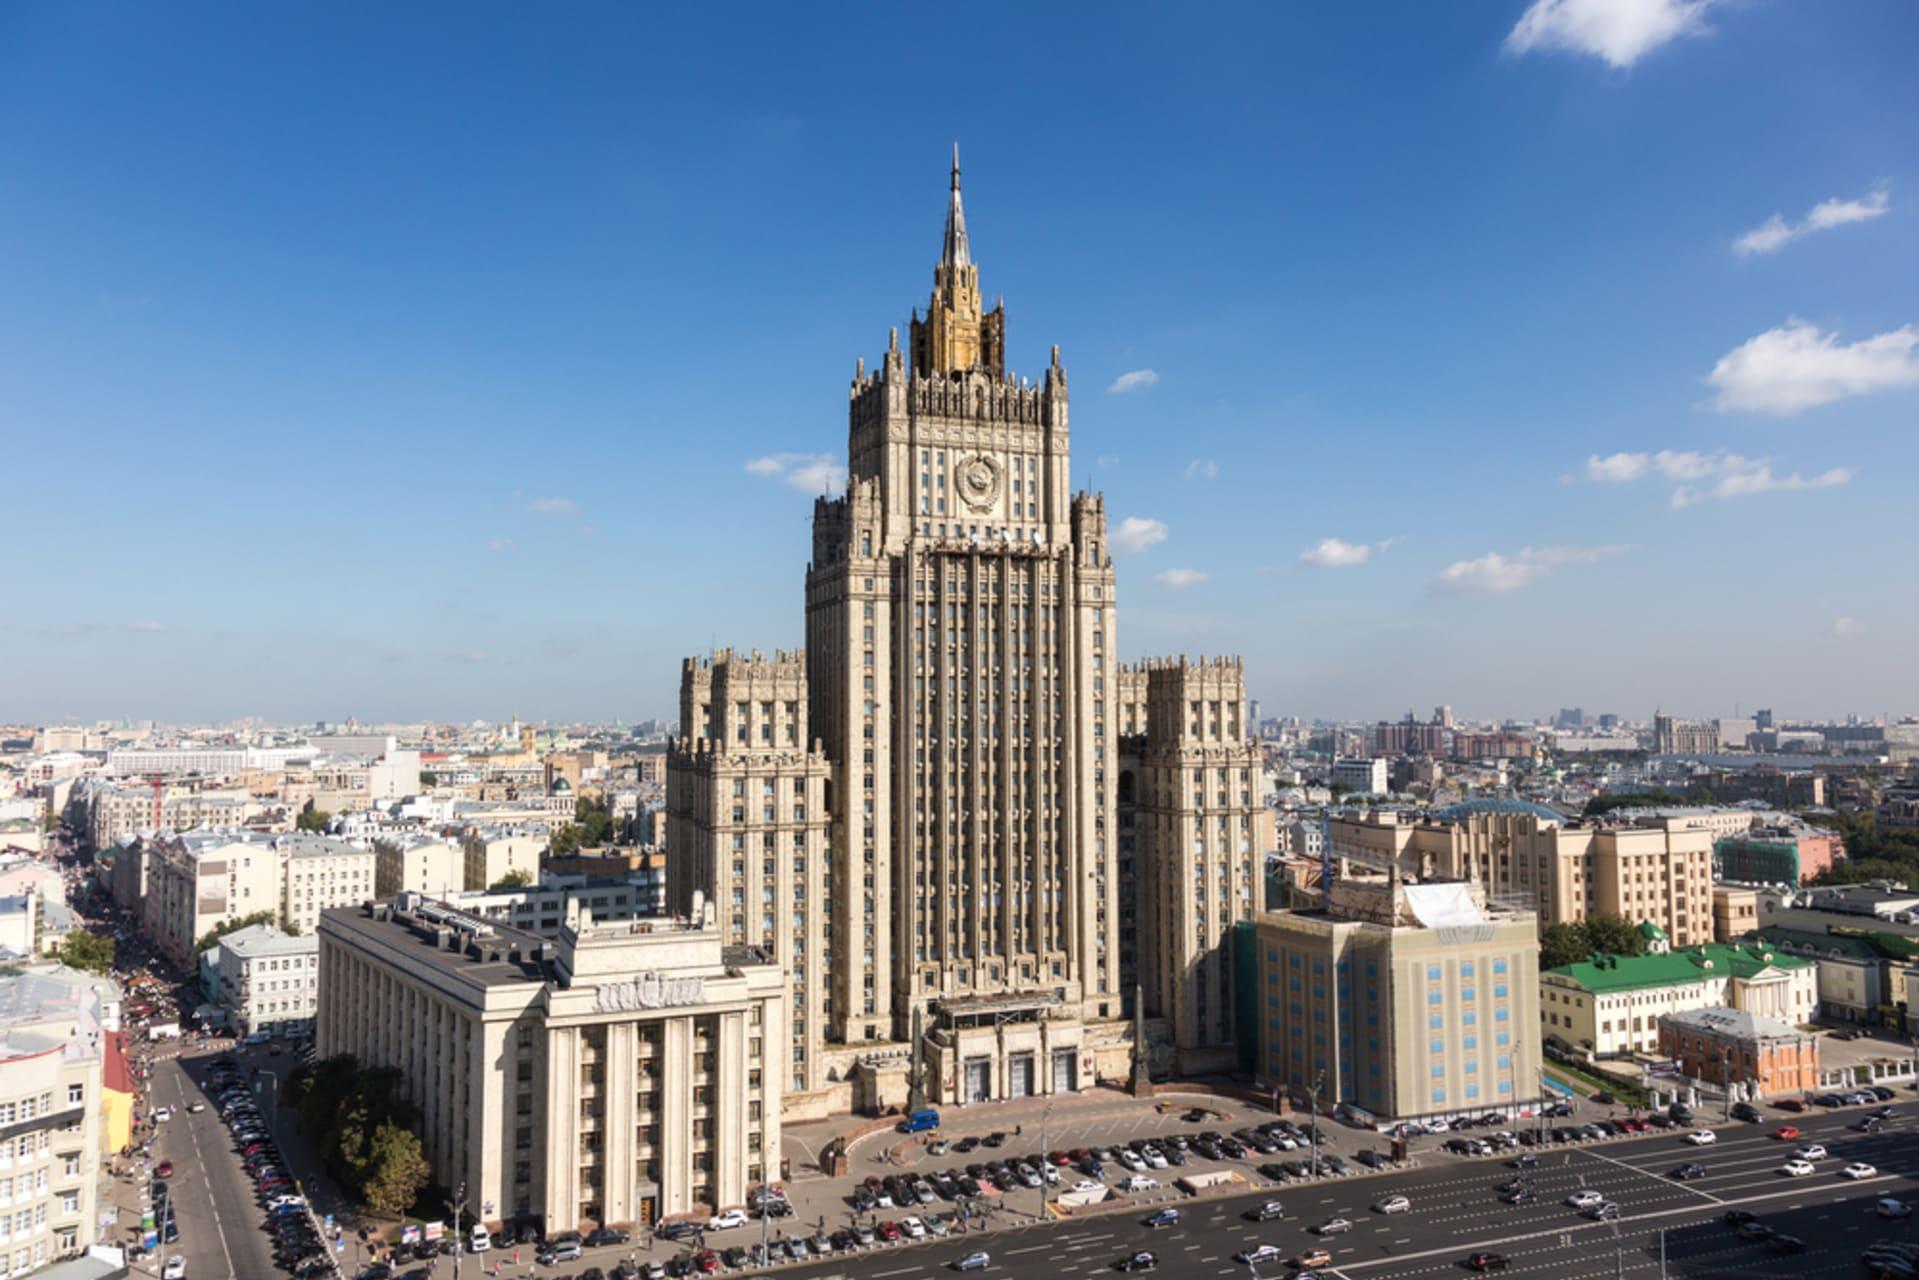 Moscow - Arbat Street and Stalin Skyscraper